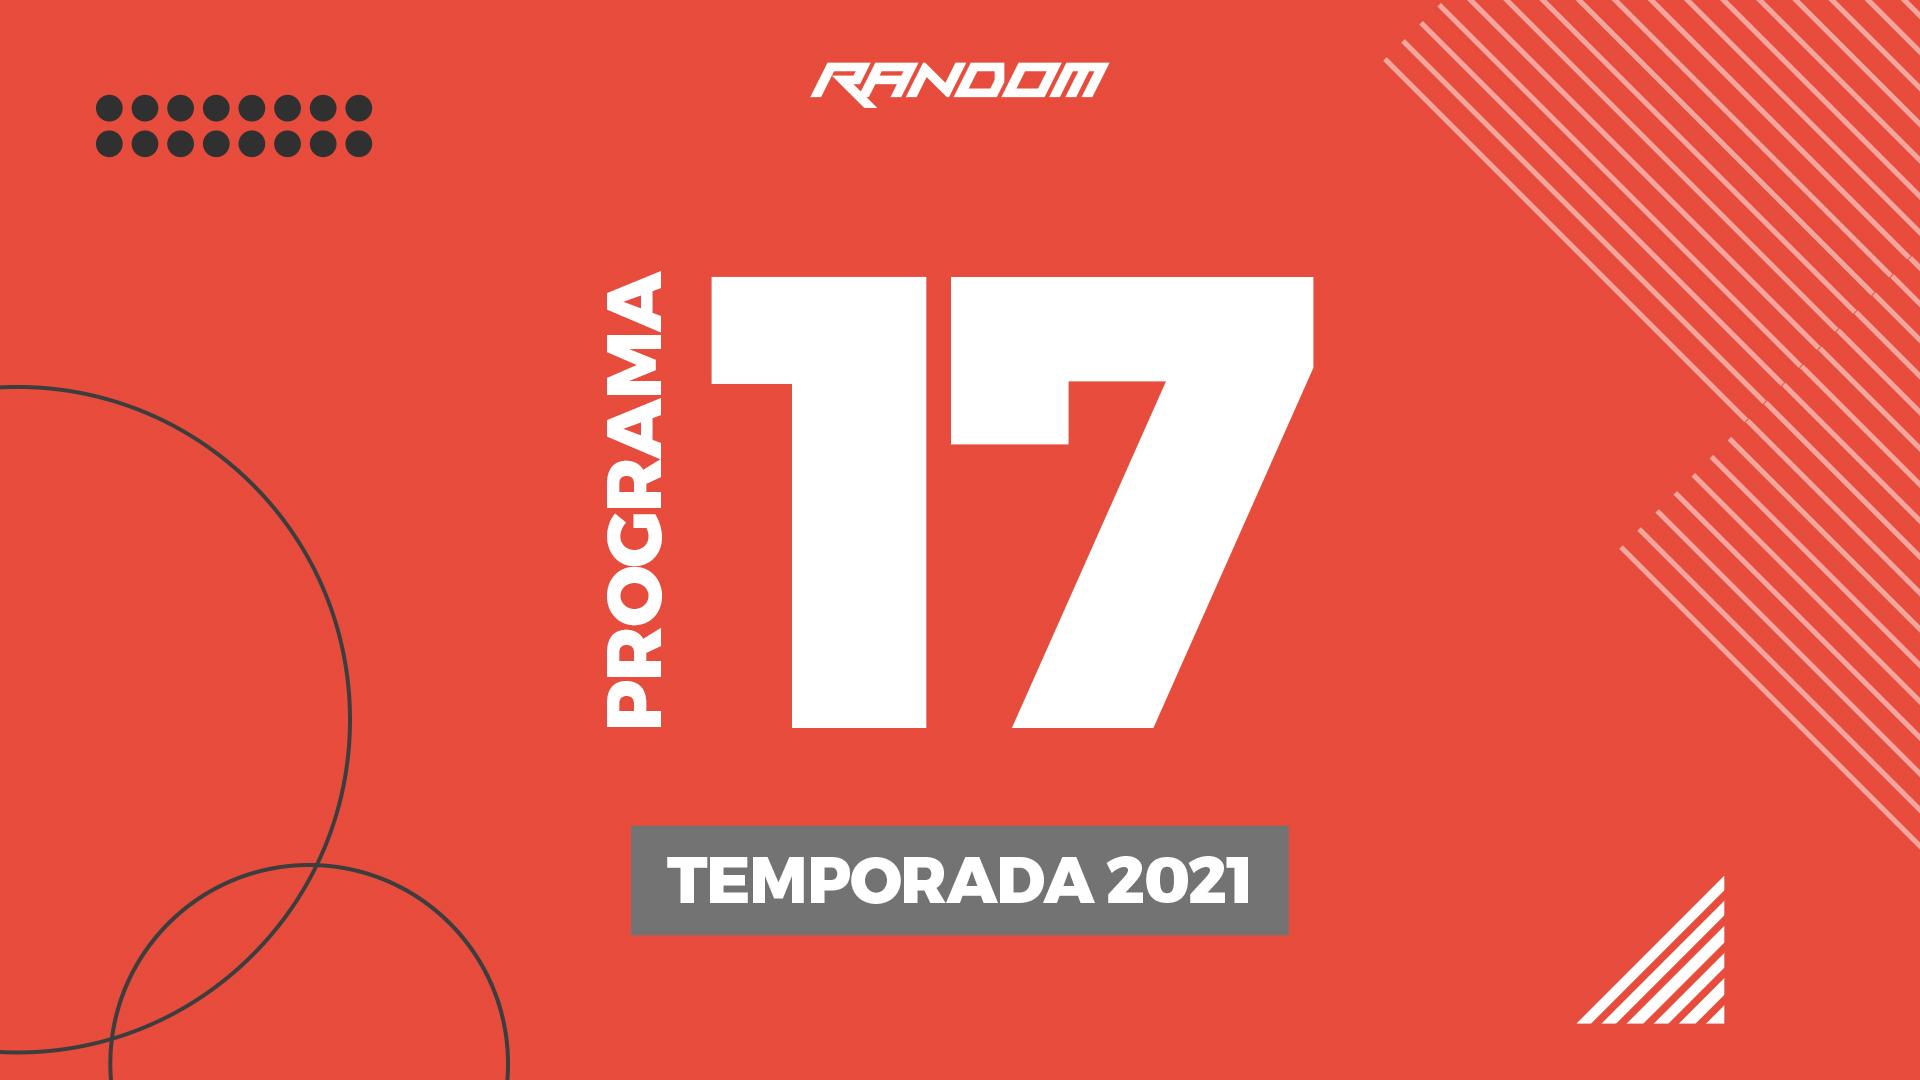 Programa Nº 17 de la Temporada 2021 de Random